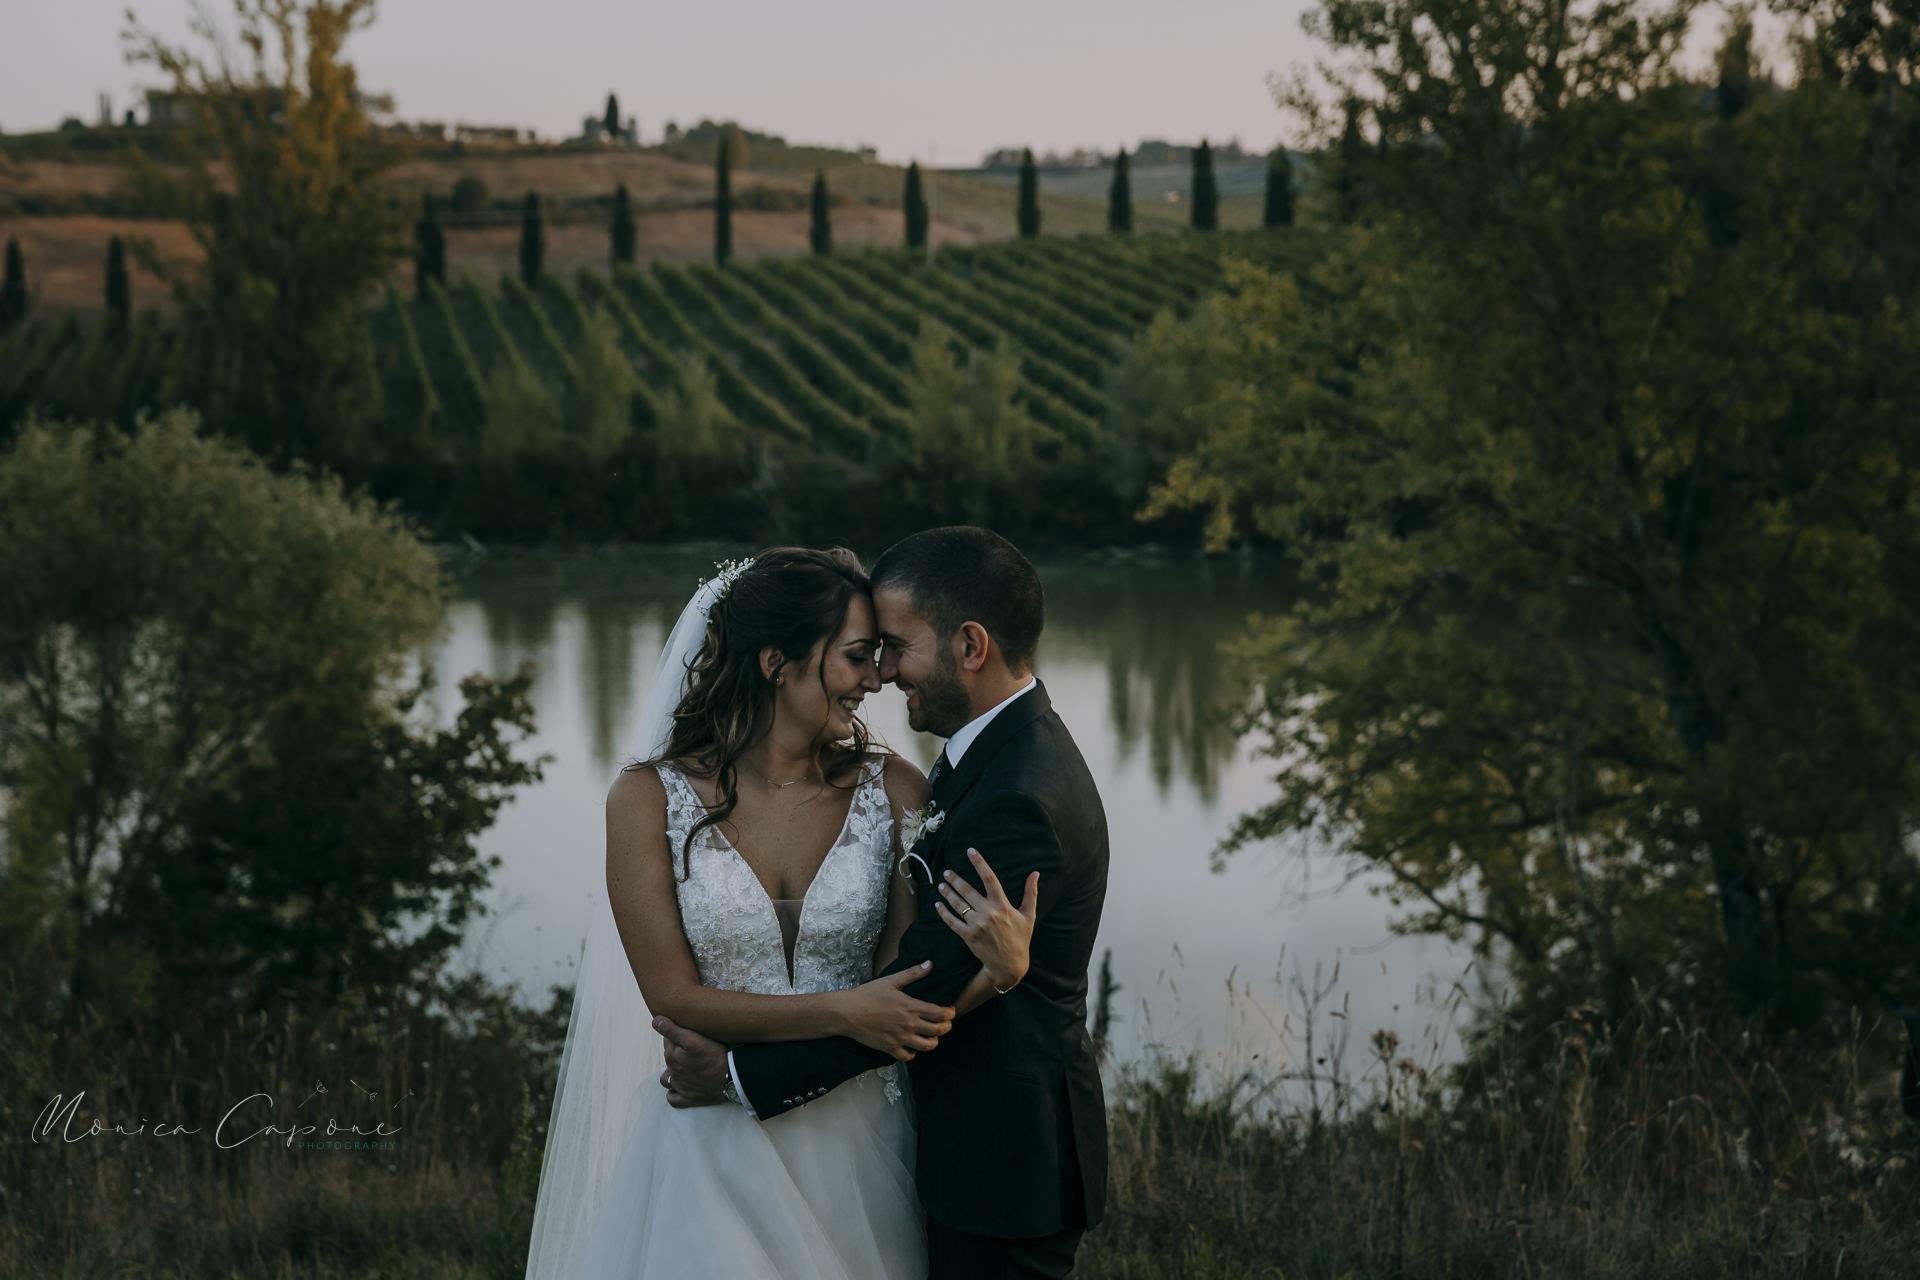 fotografo-di-matrimonio-siena